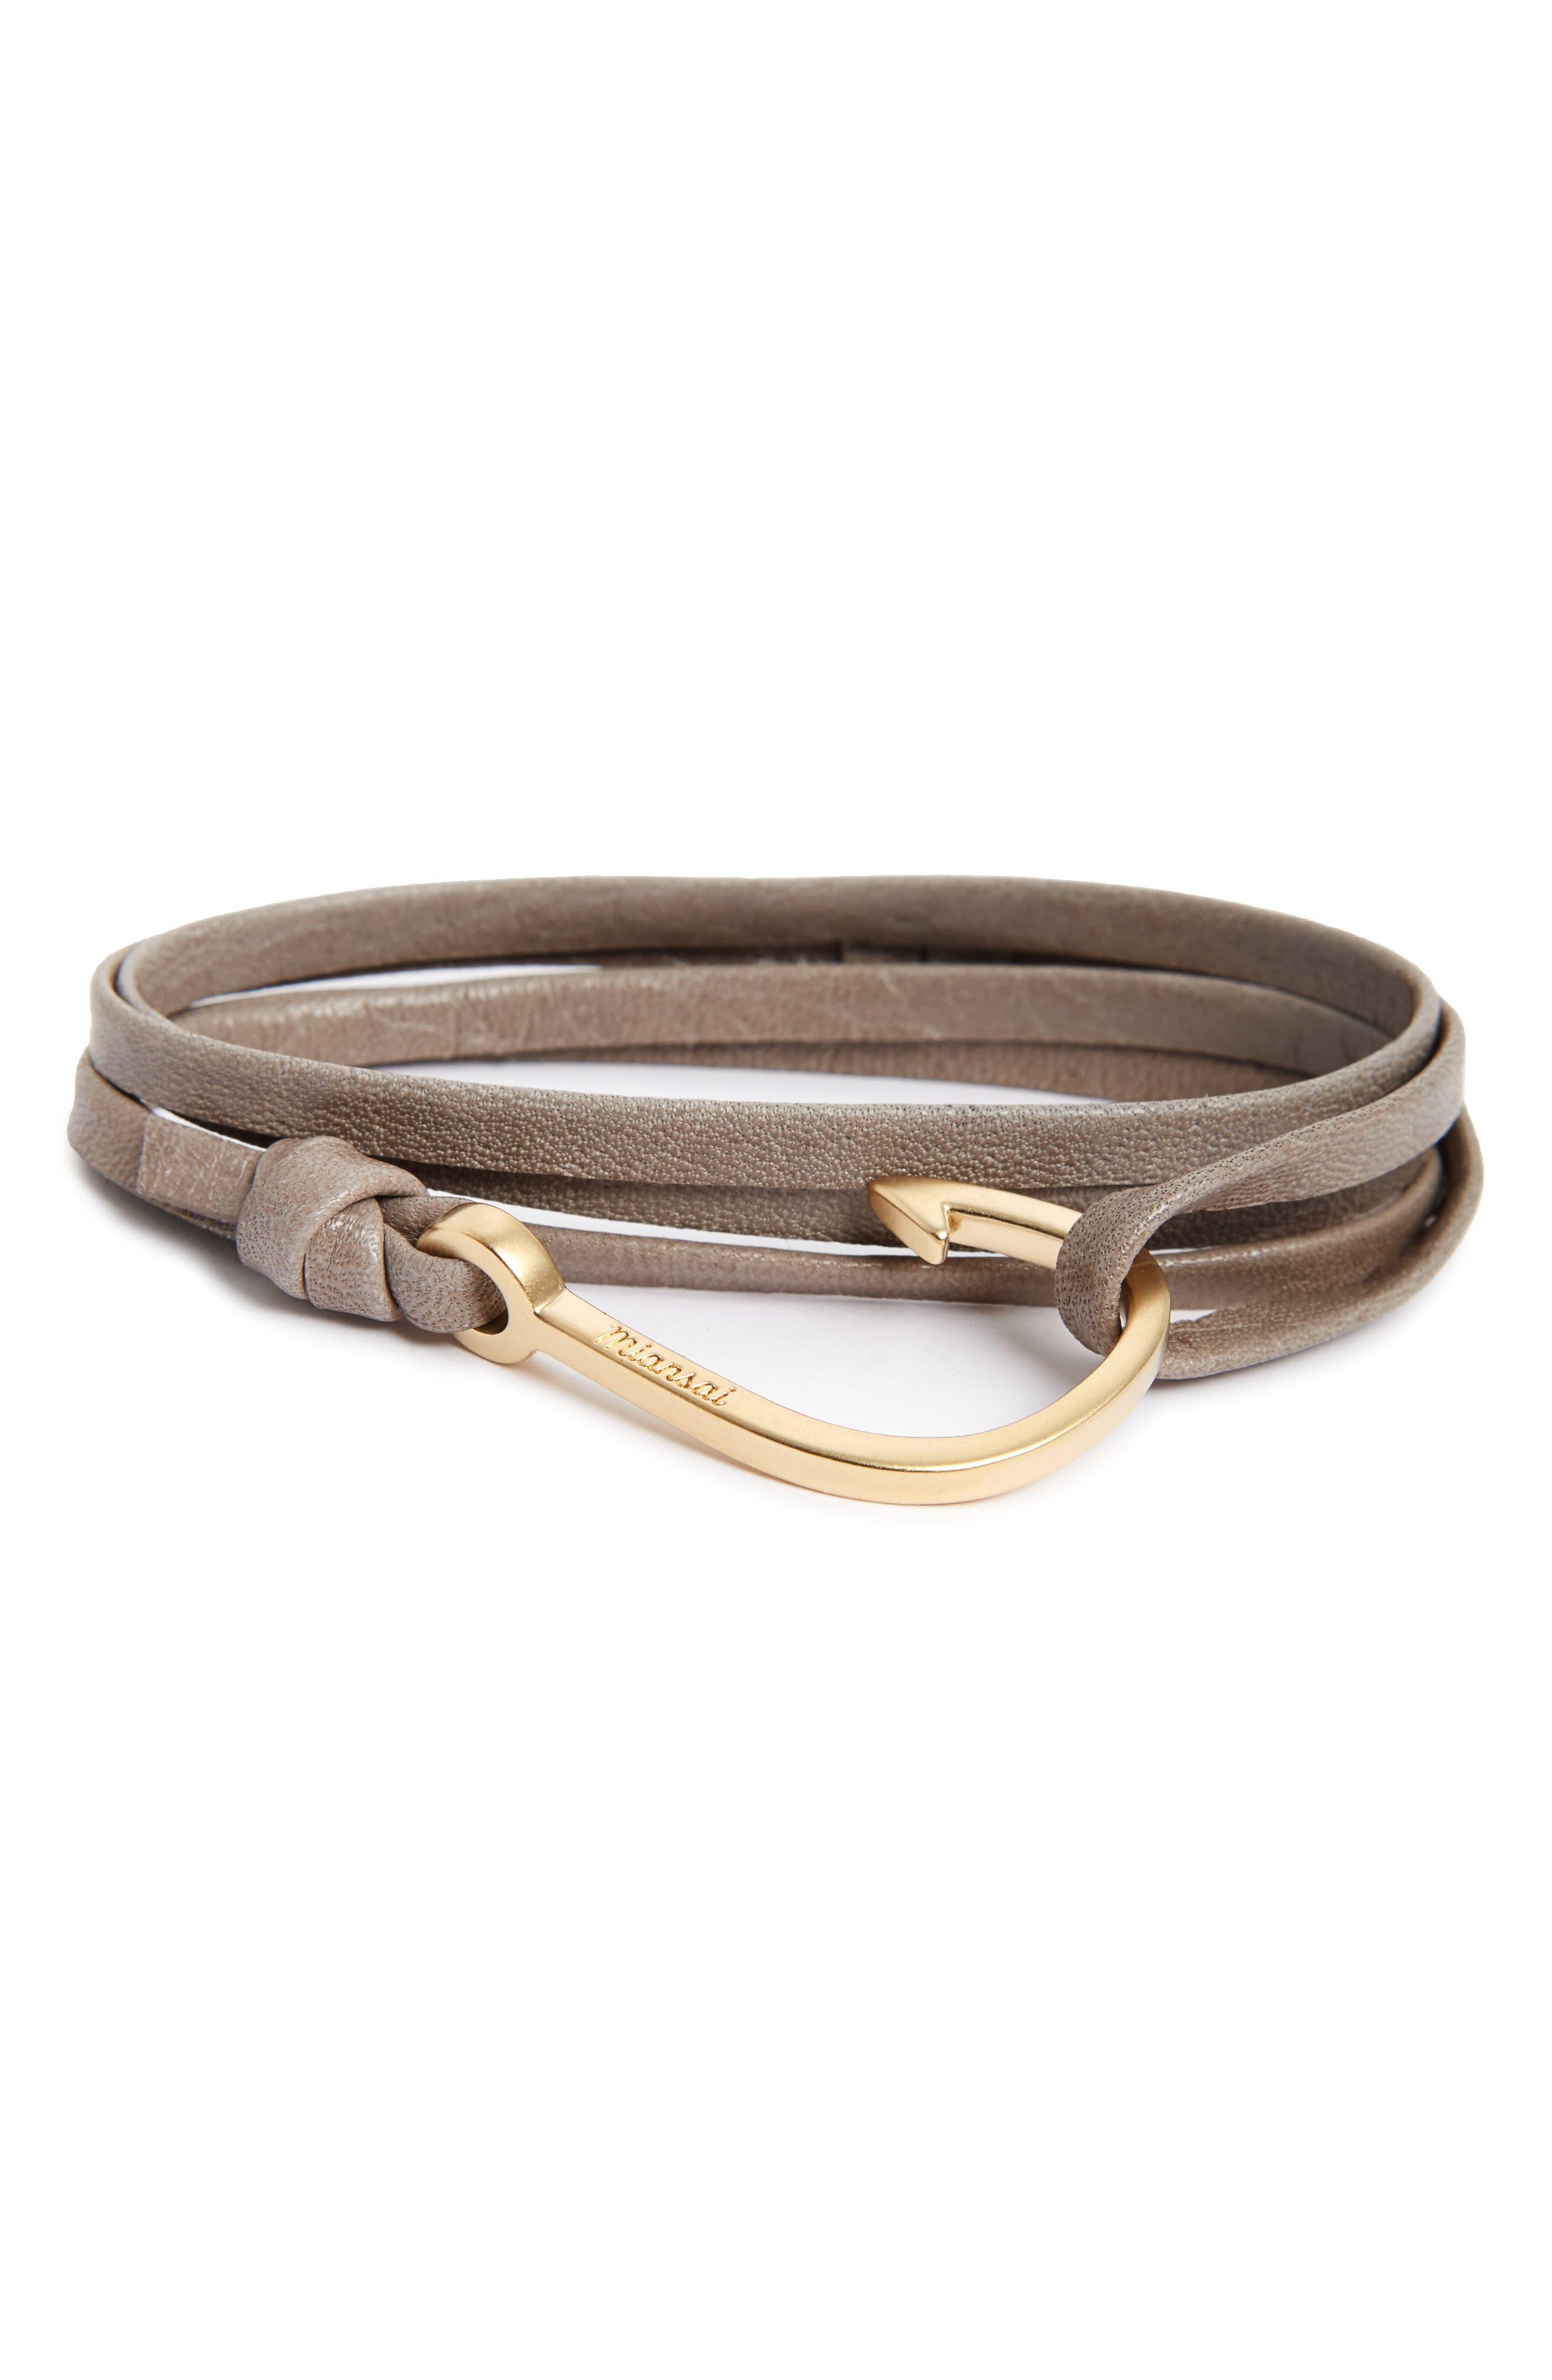 Hook On Leather Wrap Bracelet,                             Alternate thumbnail 3, color,